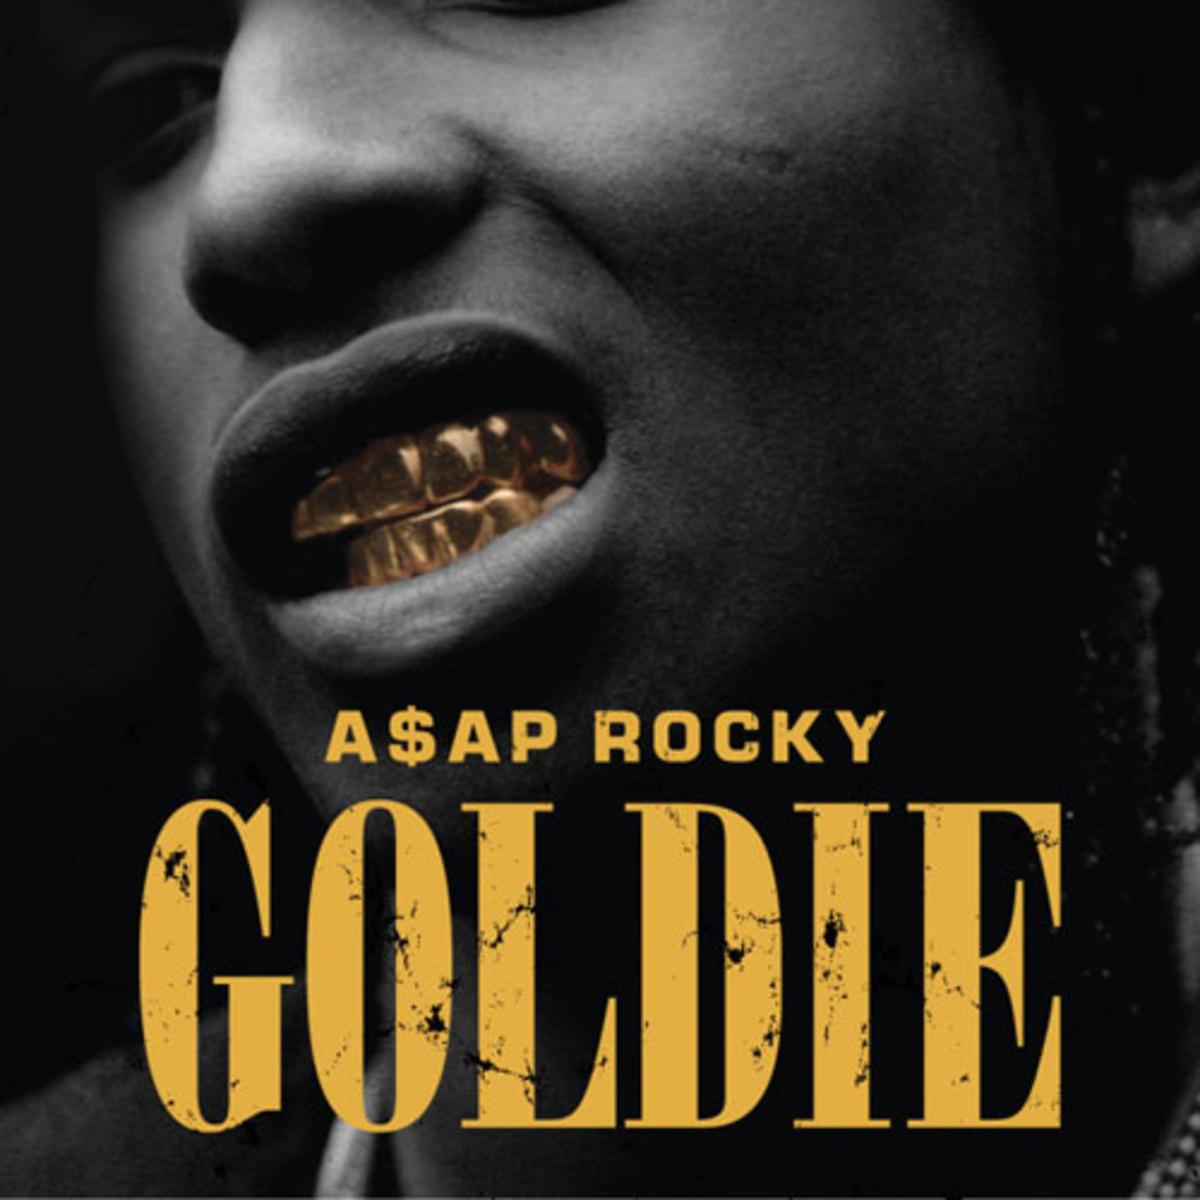 asaprocky-goldie2.jpg